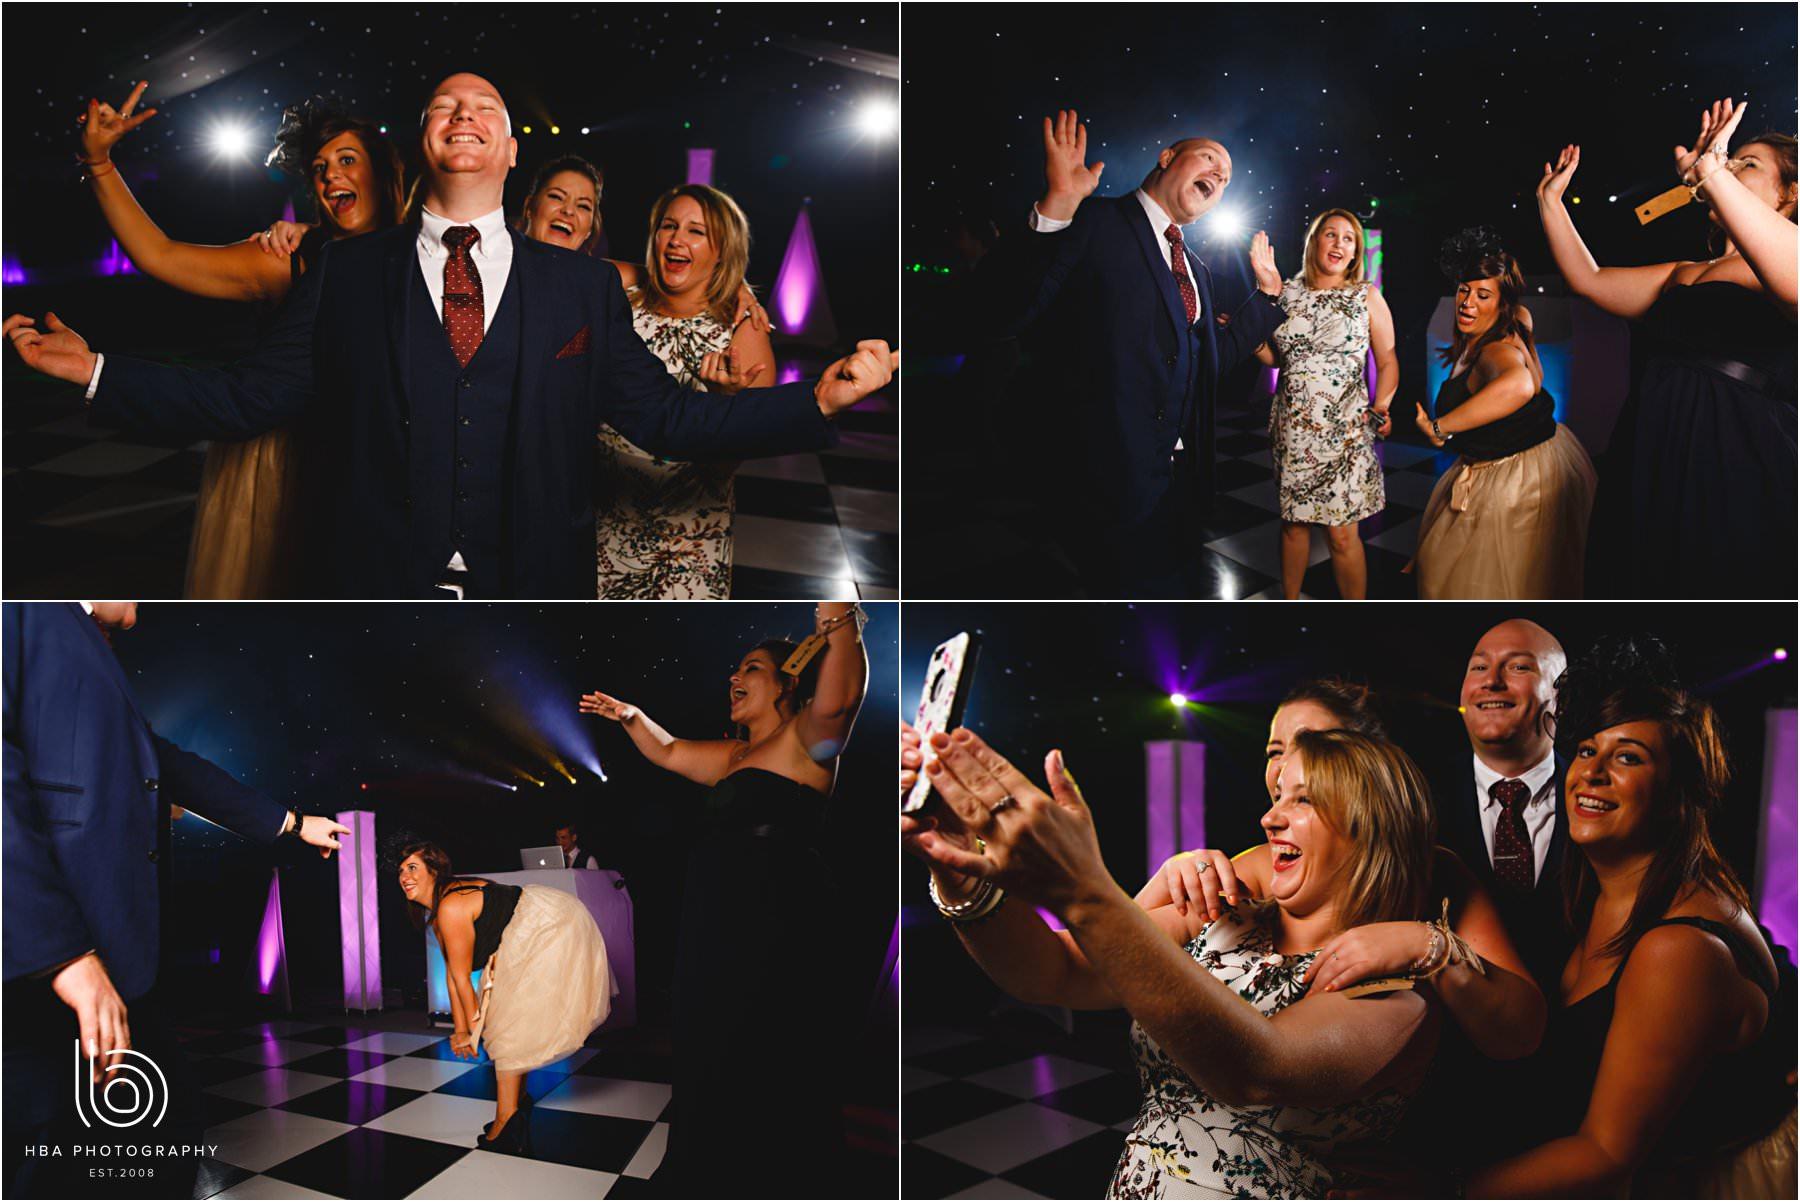 everyone dancing at the wedding